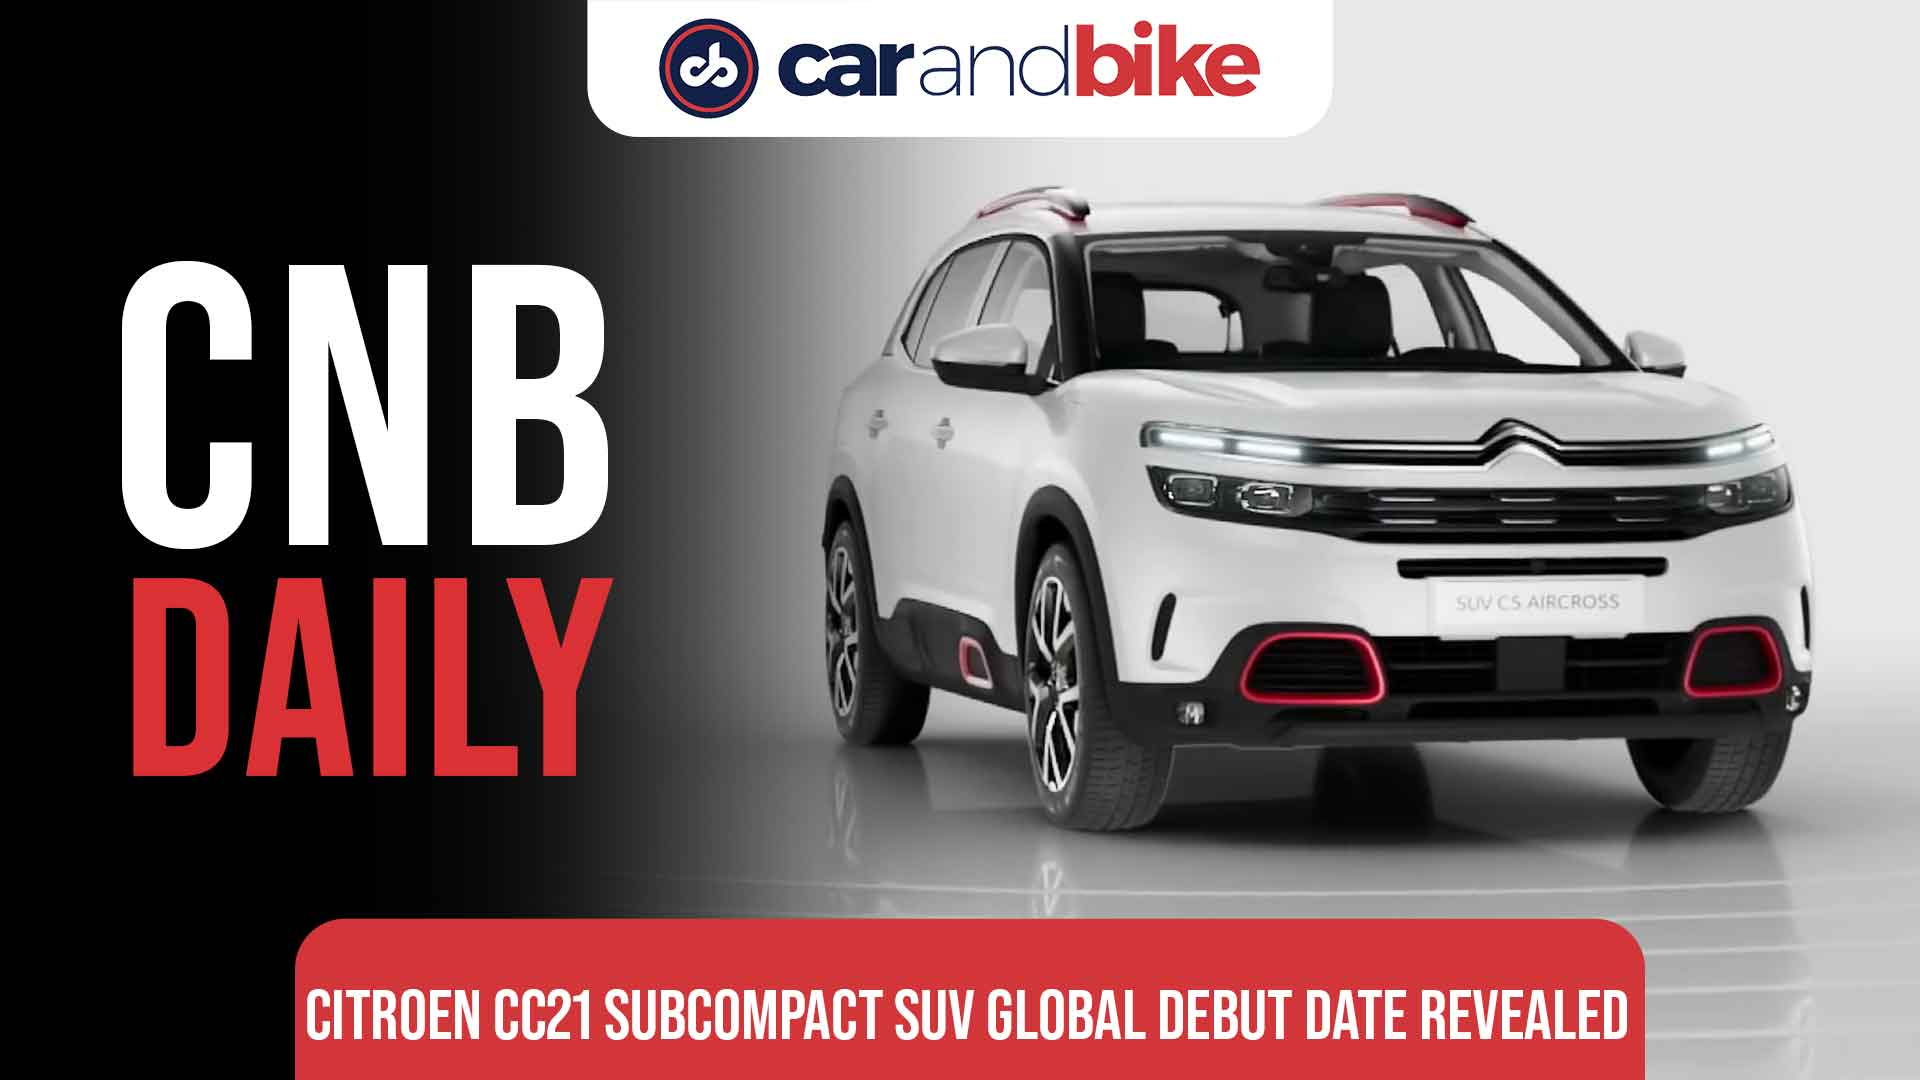 Citroen CC21 subcompact SUV global debut on September 16